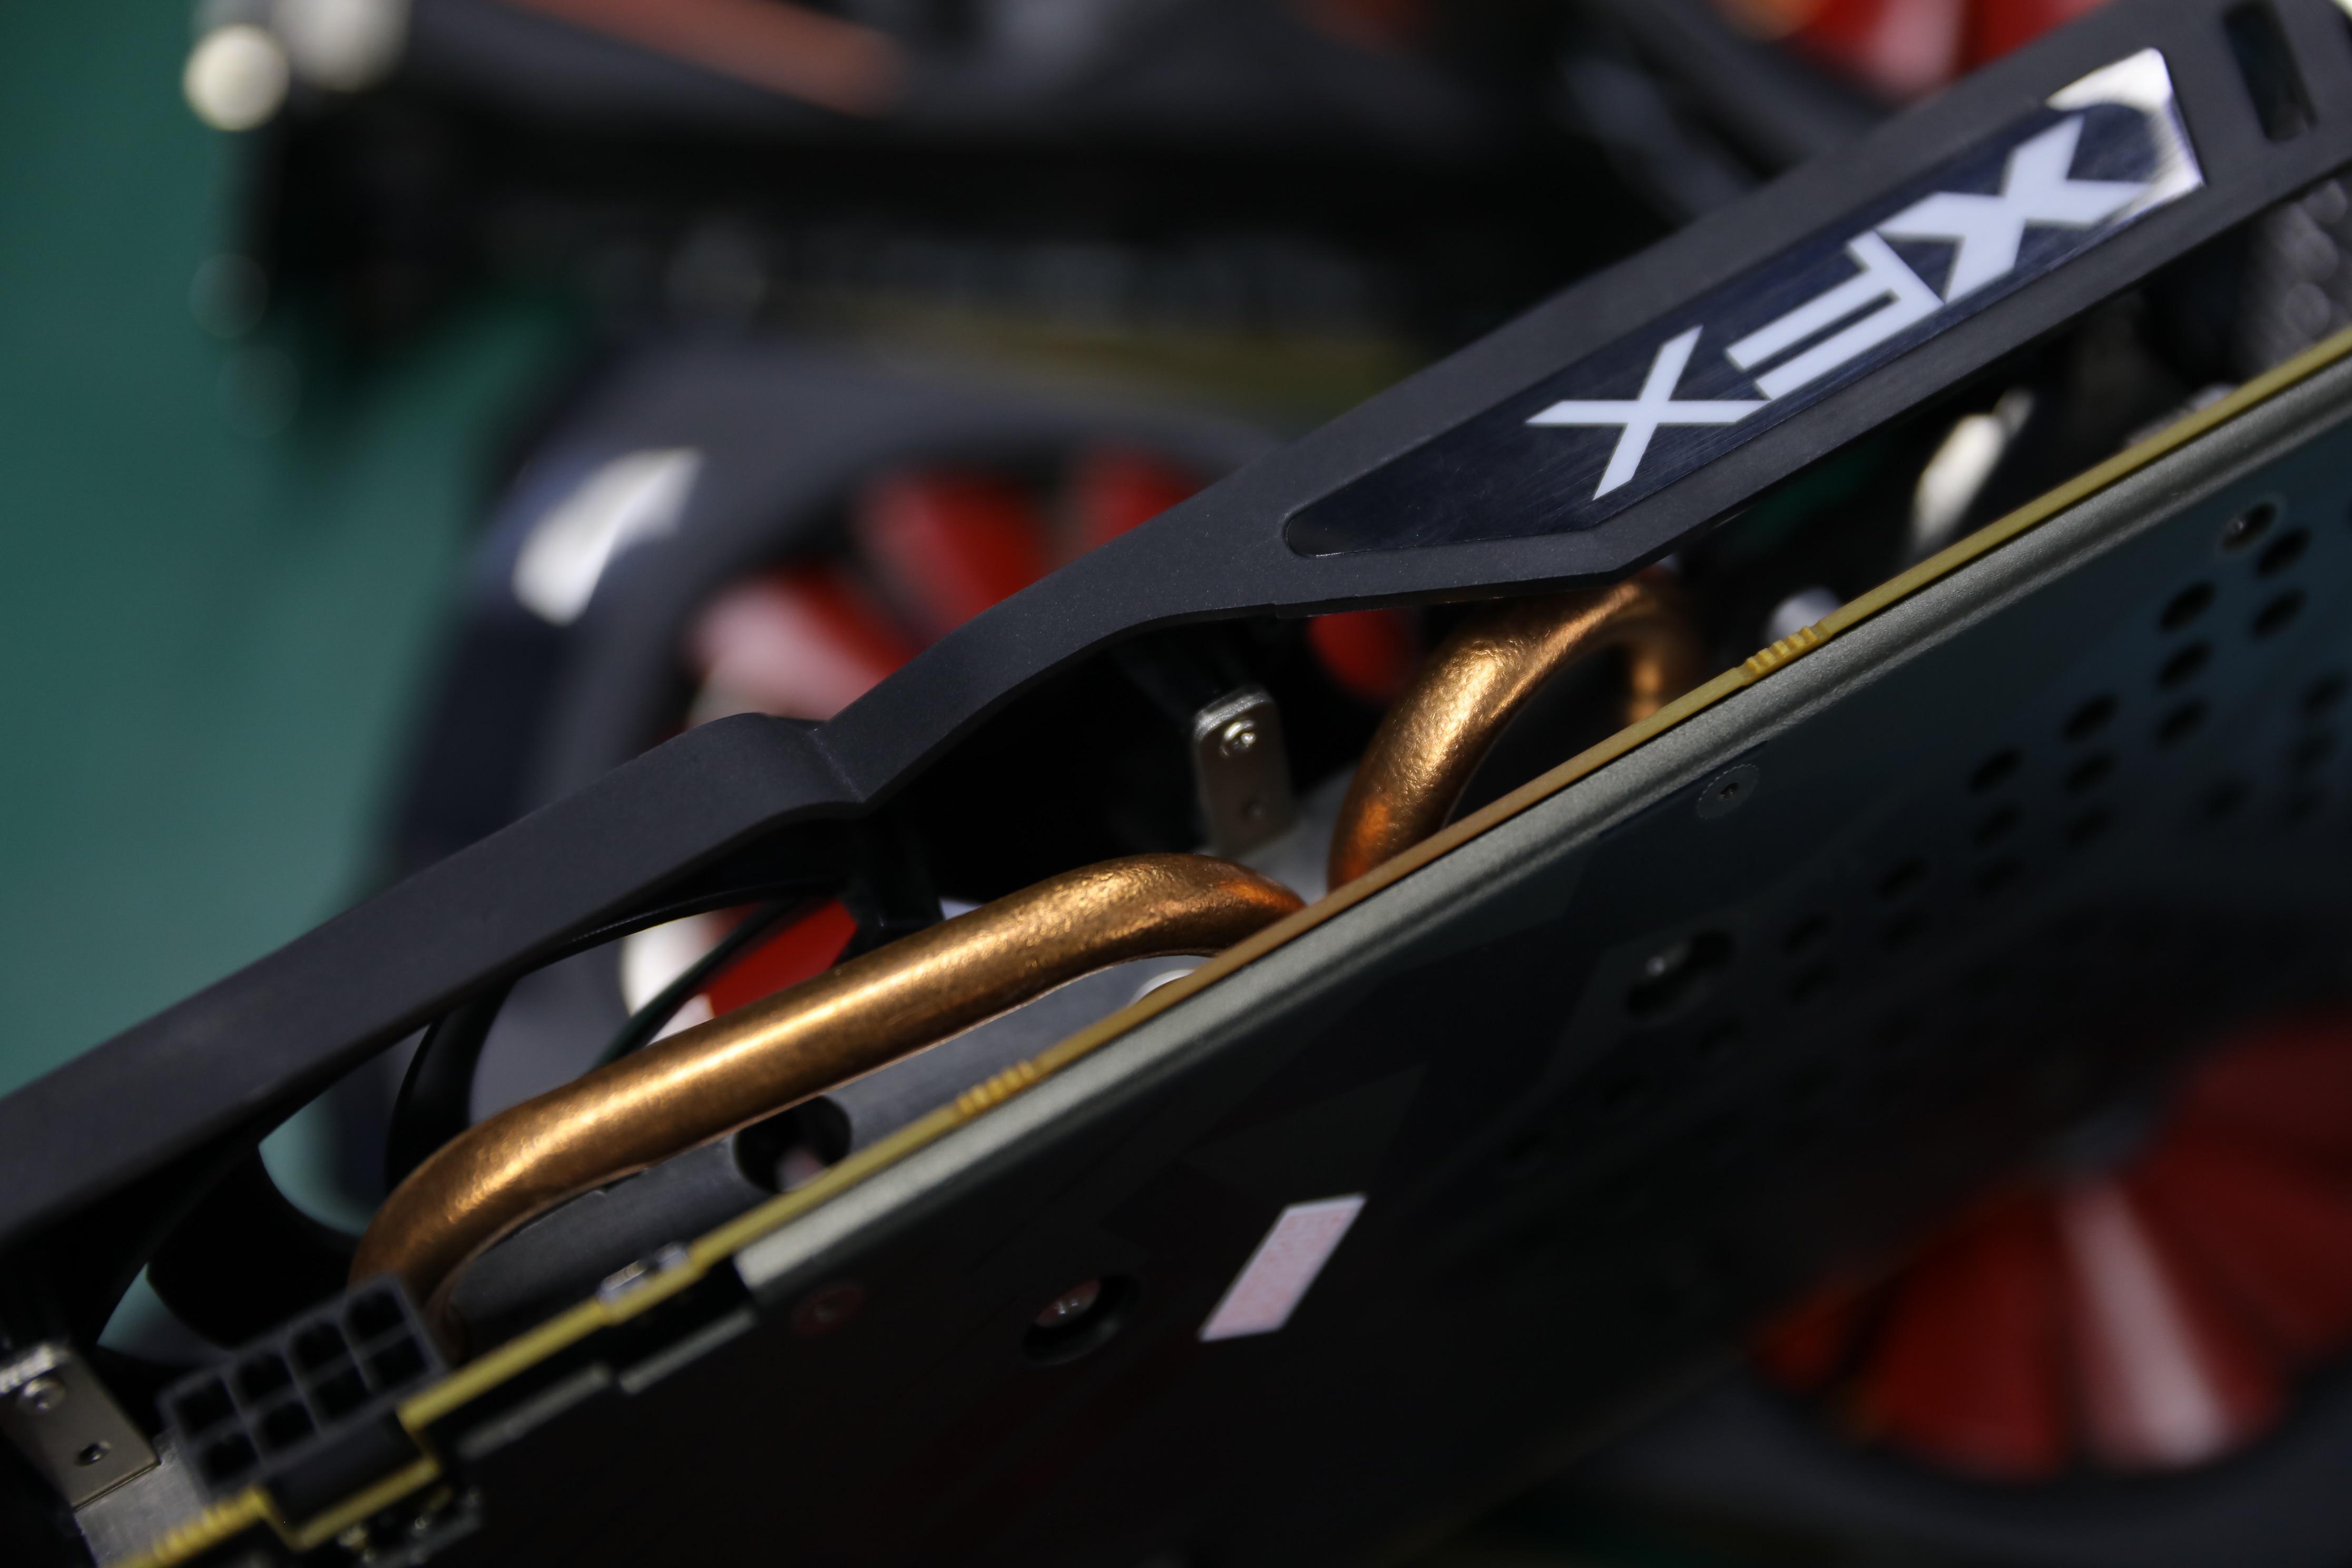 Used original XFX RX 480 4GB 256bit GDDR5 pc gaming graphics cards video card 480 4g 570 4gb xfx rx 480 4g xfx rx 480 4 gb 3